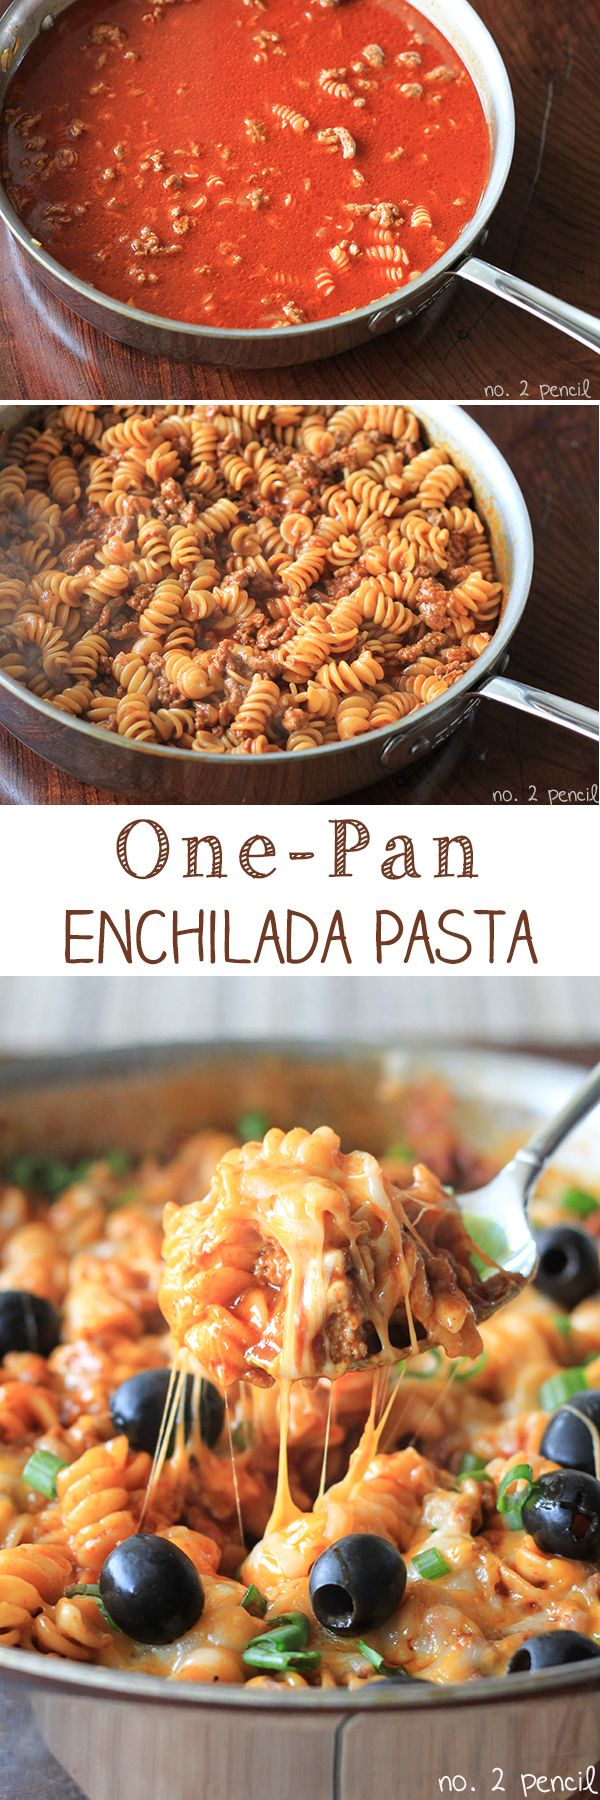 One-Pan Enchilada Pasta - so easy and so good!